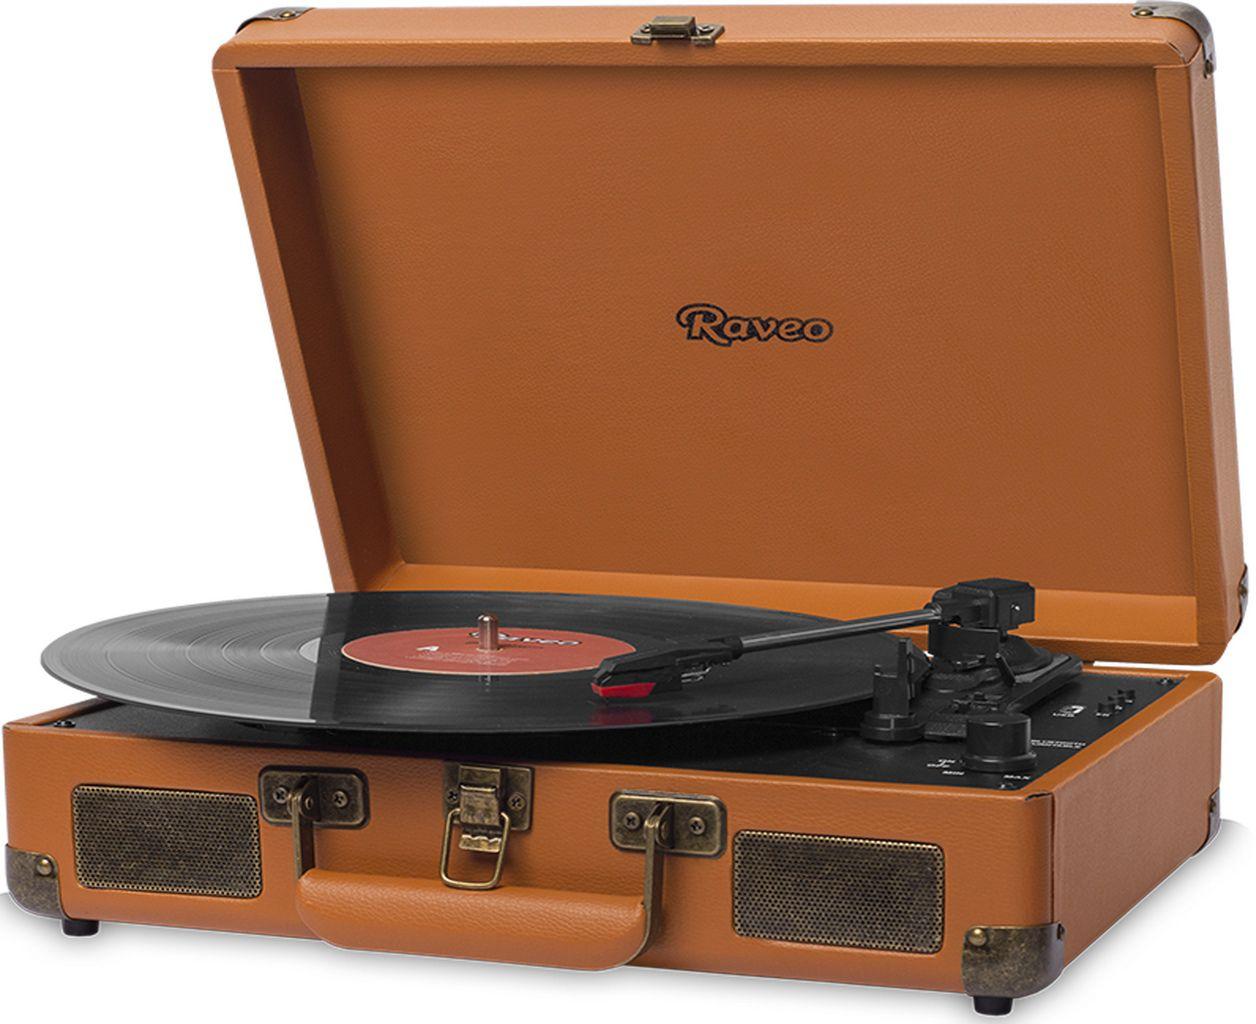 Vitrola Toca Discos Raveo Sonetto Caramelho Bluetooth Usb Reproduz Grava Saída Auxiliar 10 Watts